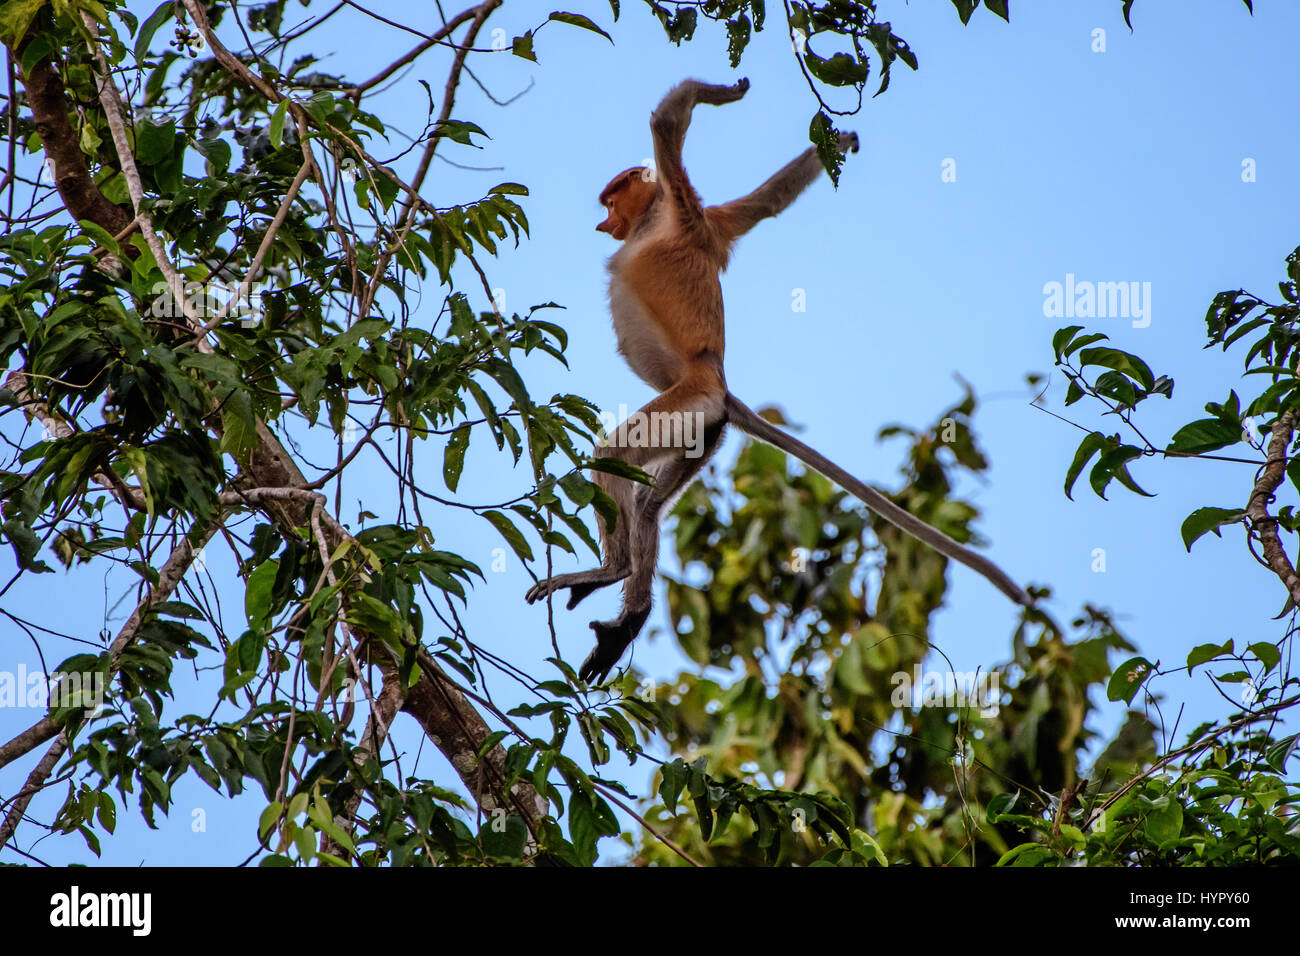 Proboscis monkey leaping from tree to tree - Stock Image